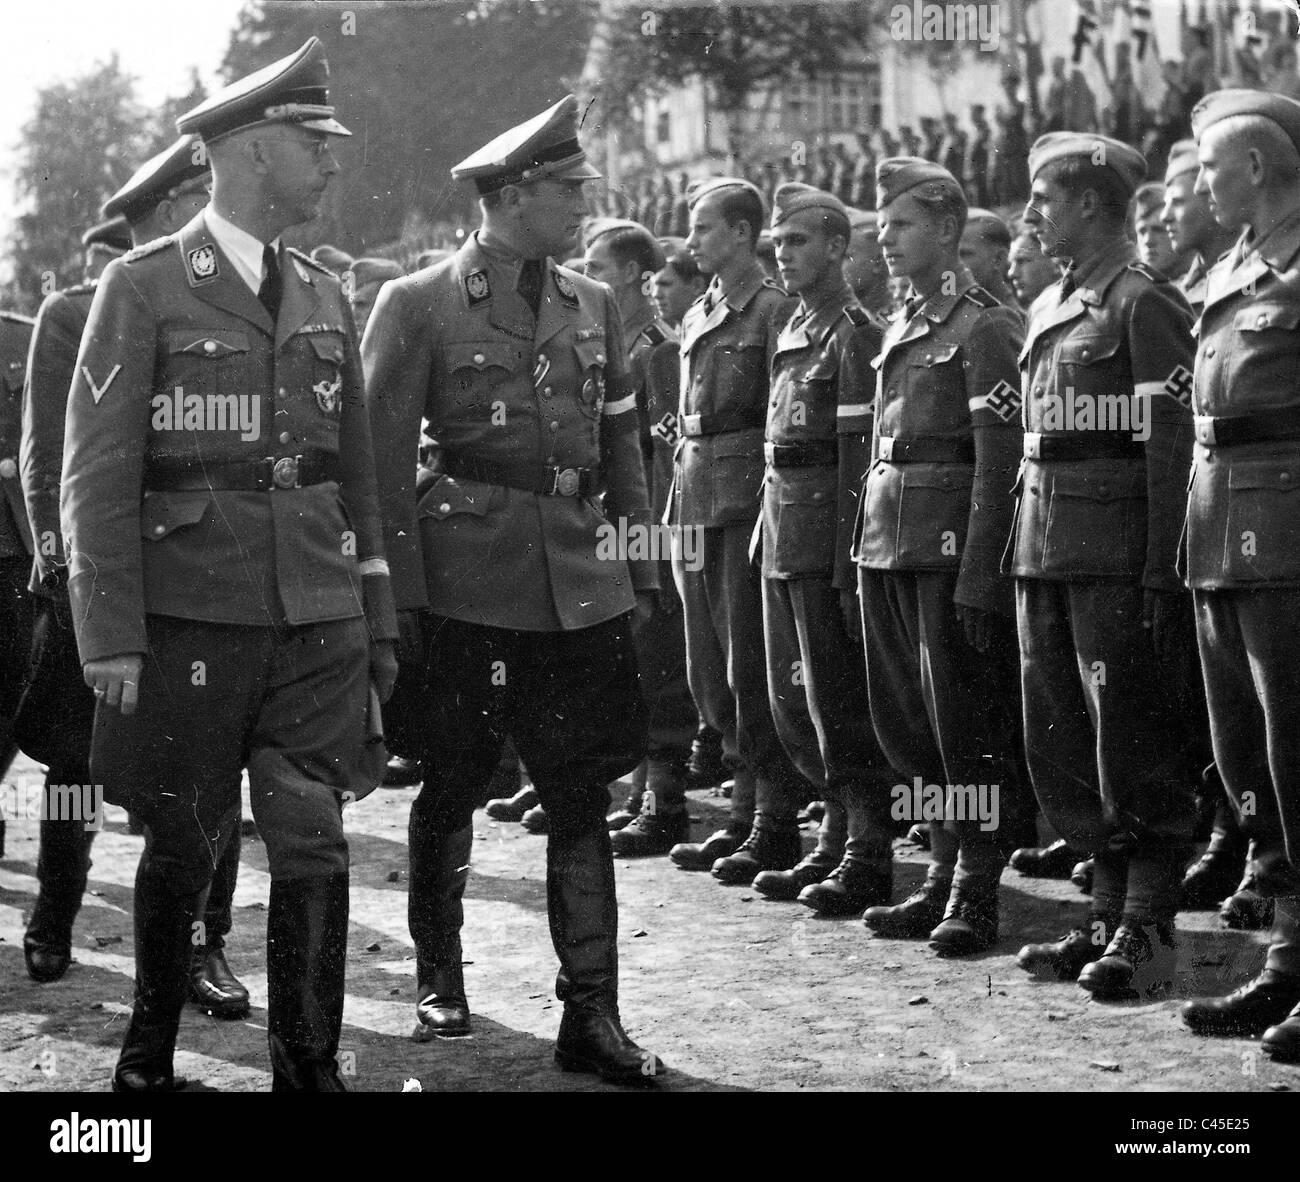 Ss Leader Heinrich Himmler Stock Photos & Ss Leader